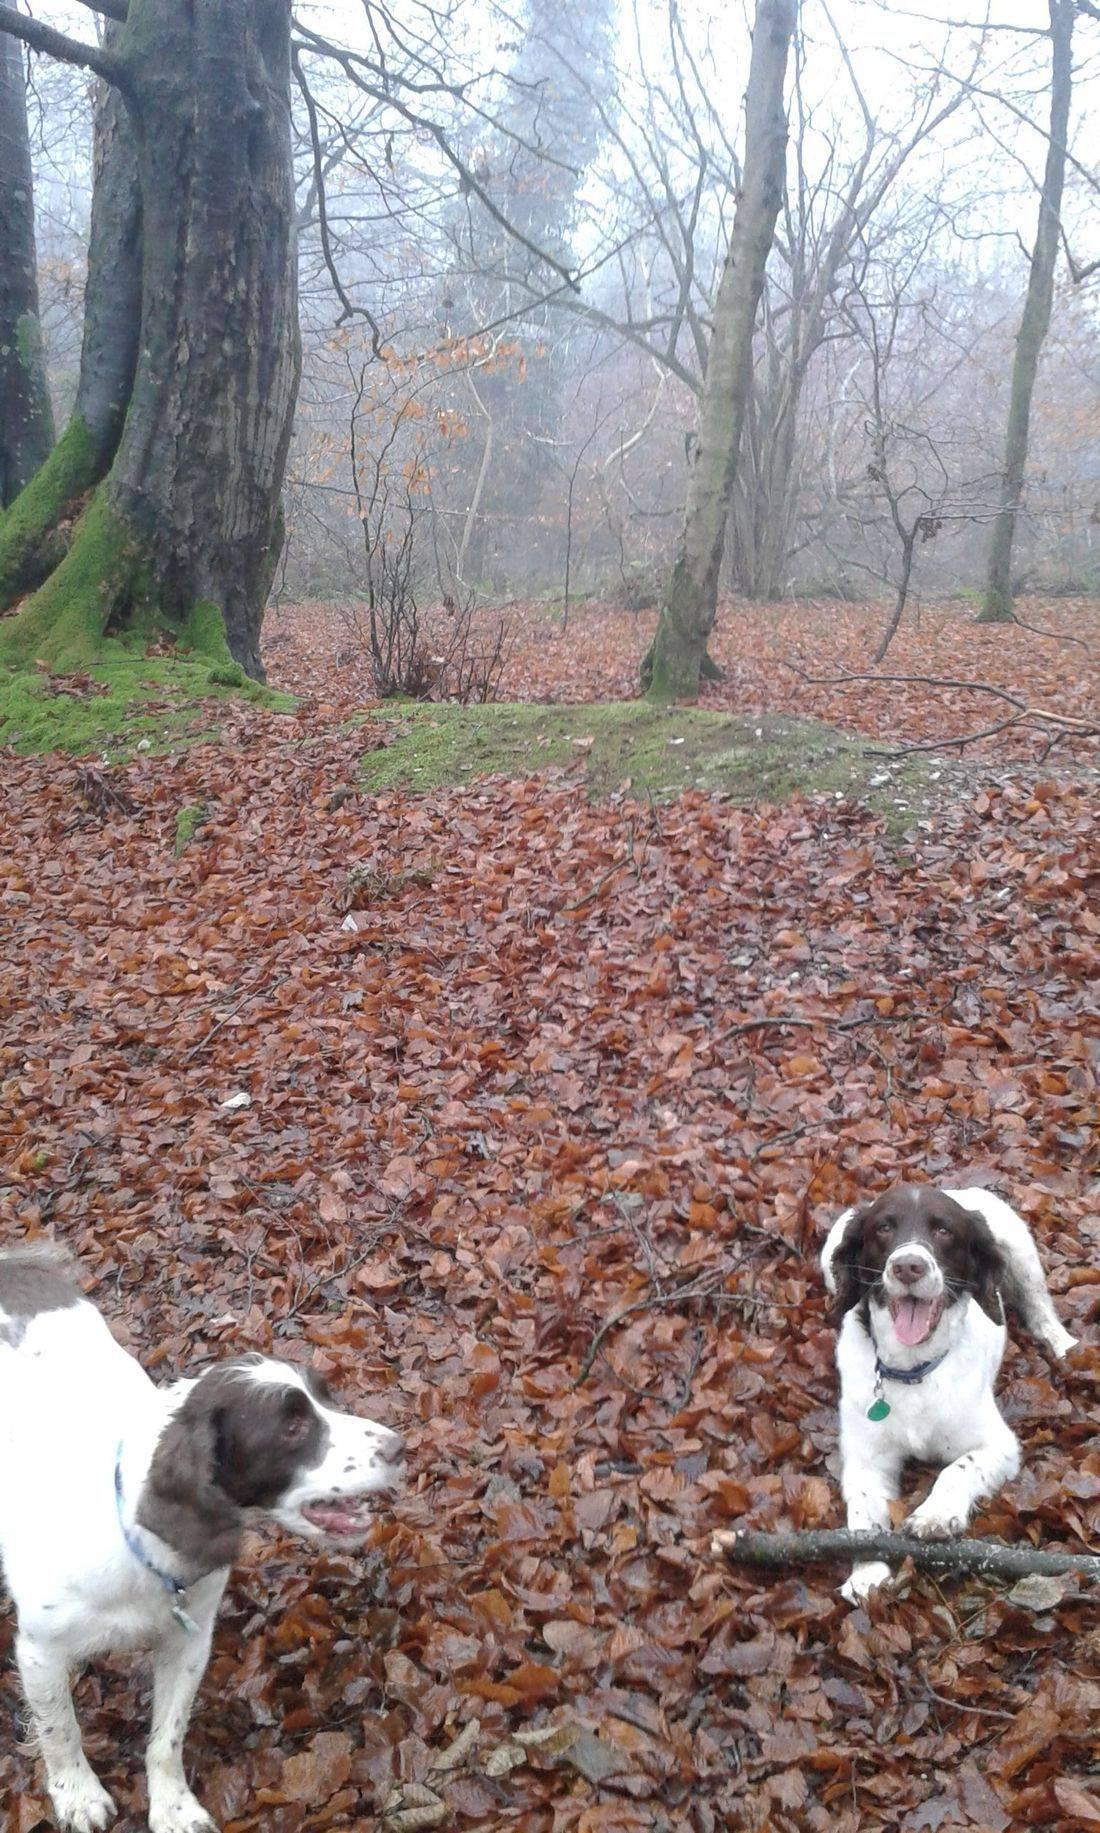 Springer spaniels in the woods